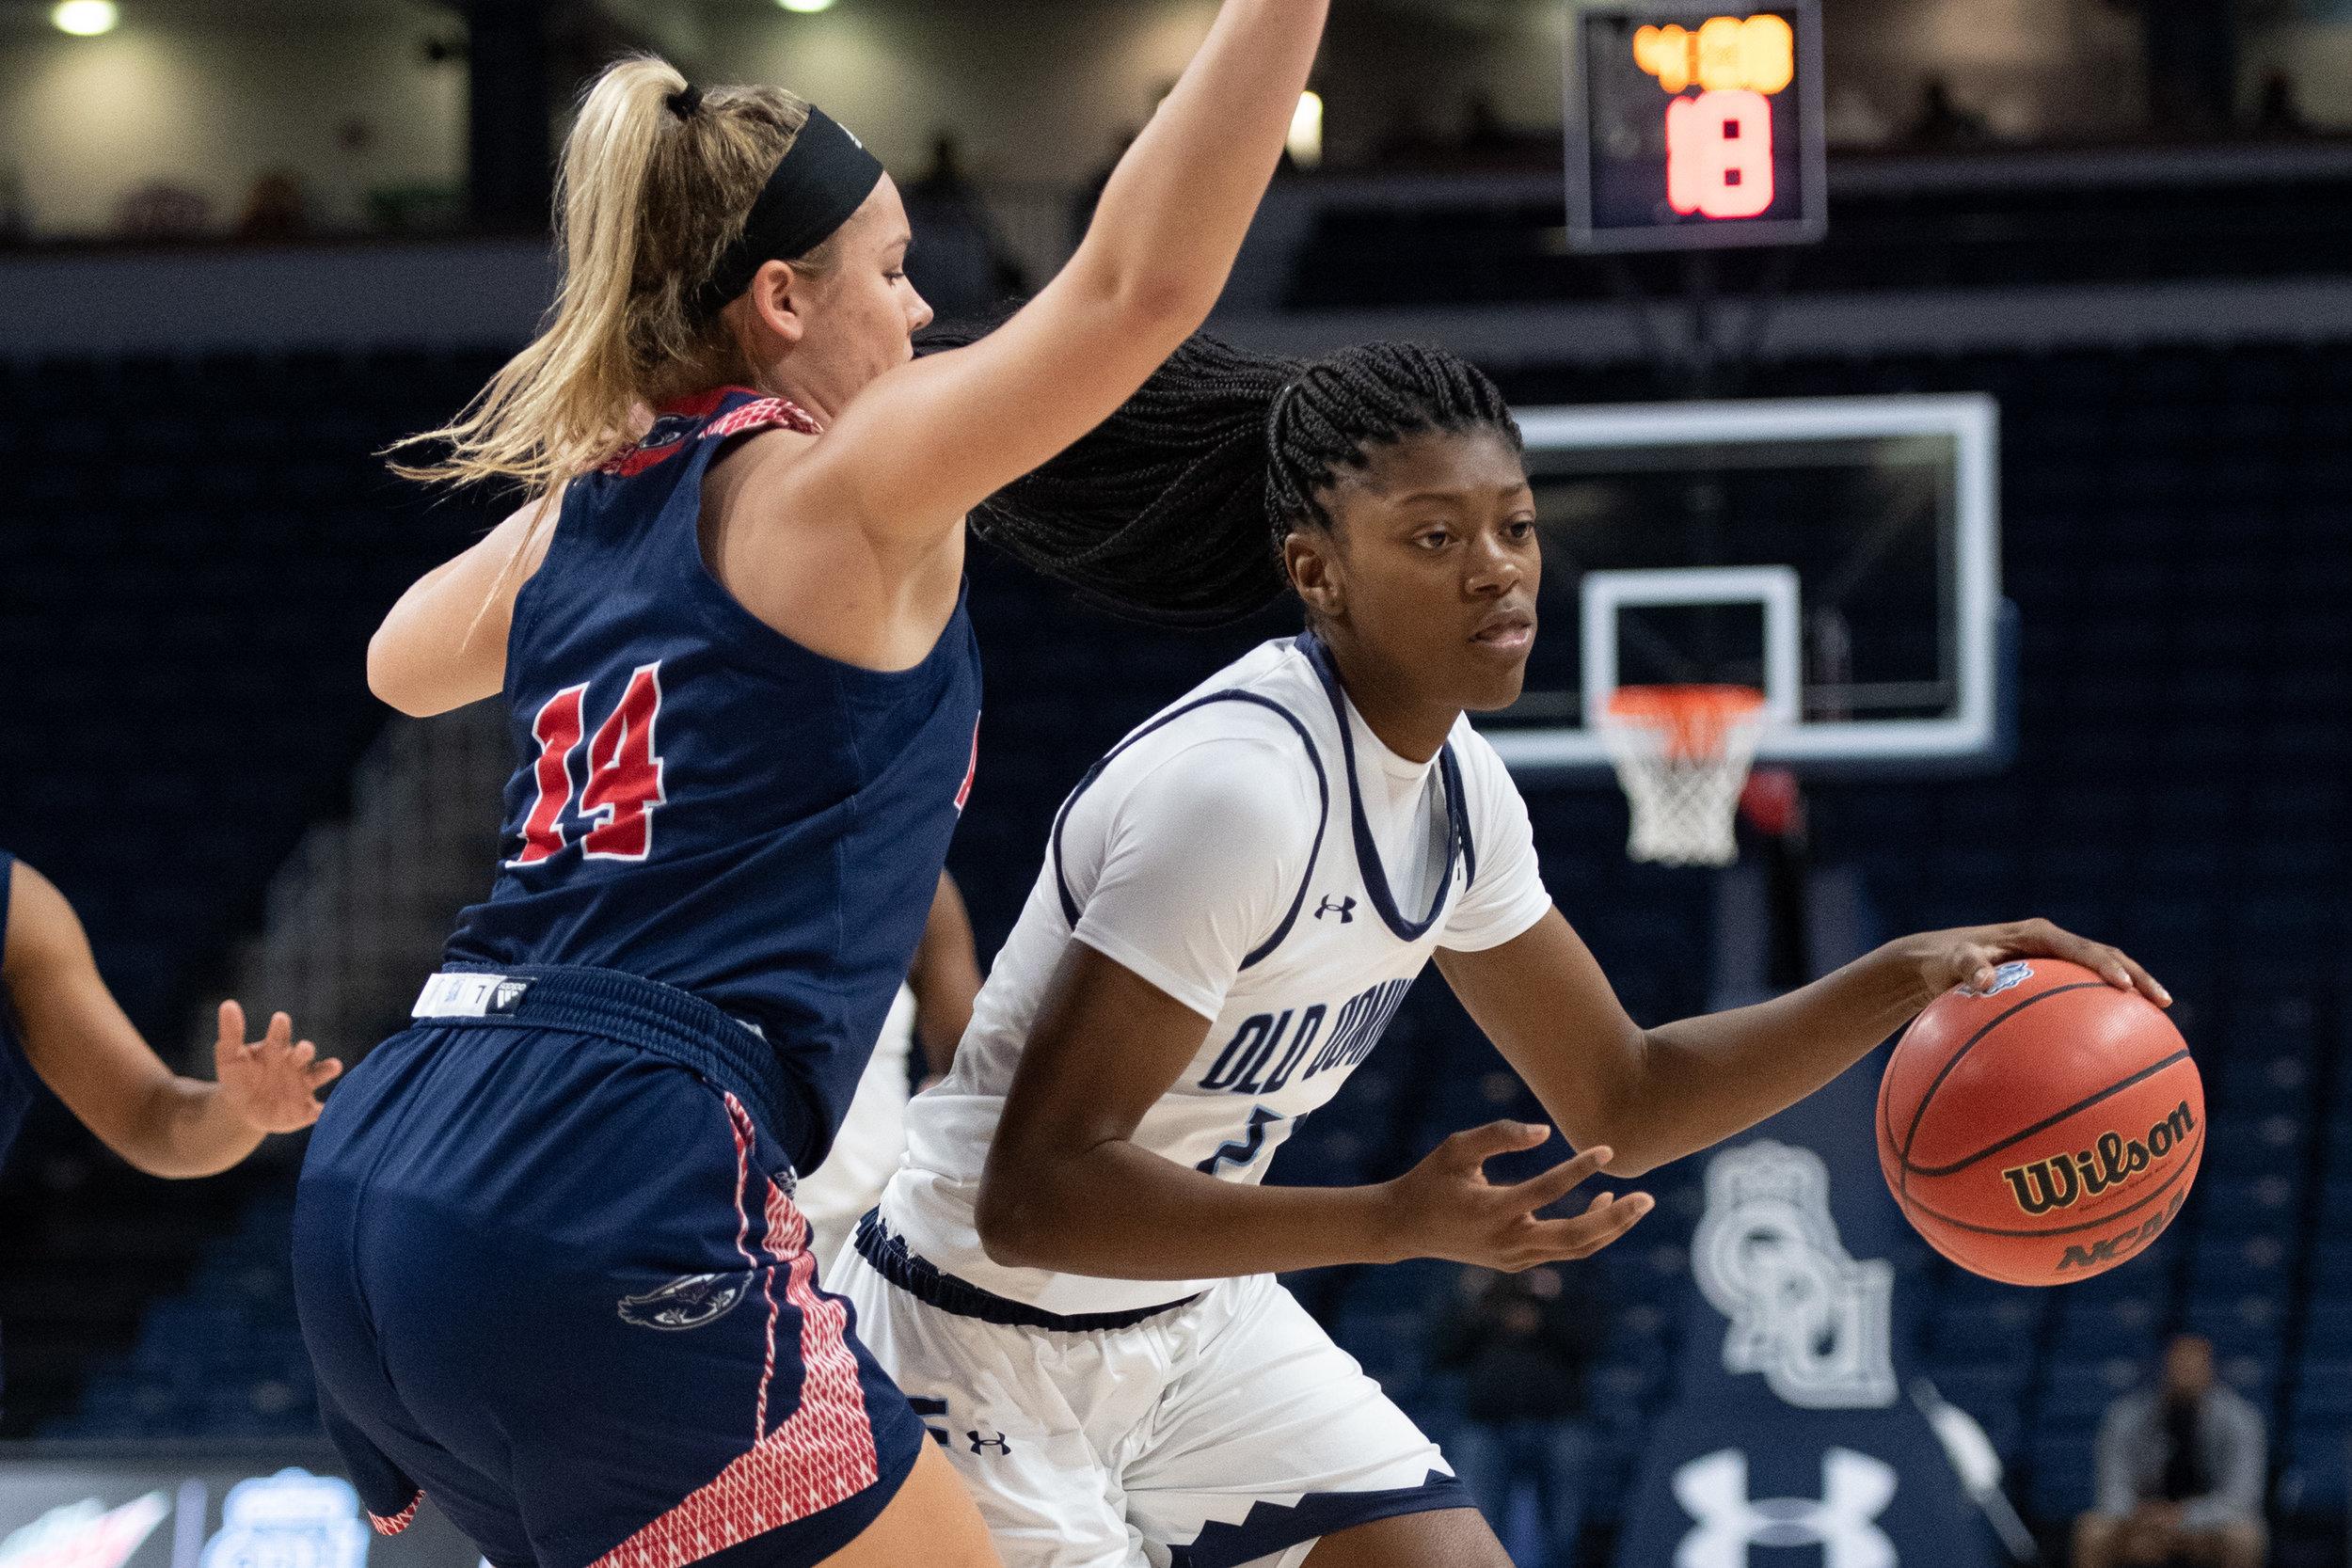 Womens Basketball: Florida Atlantic vs Old Dominion